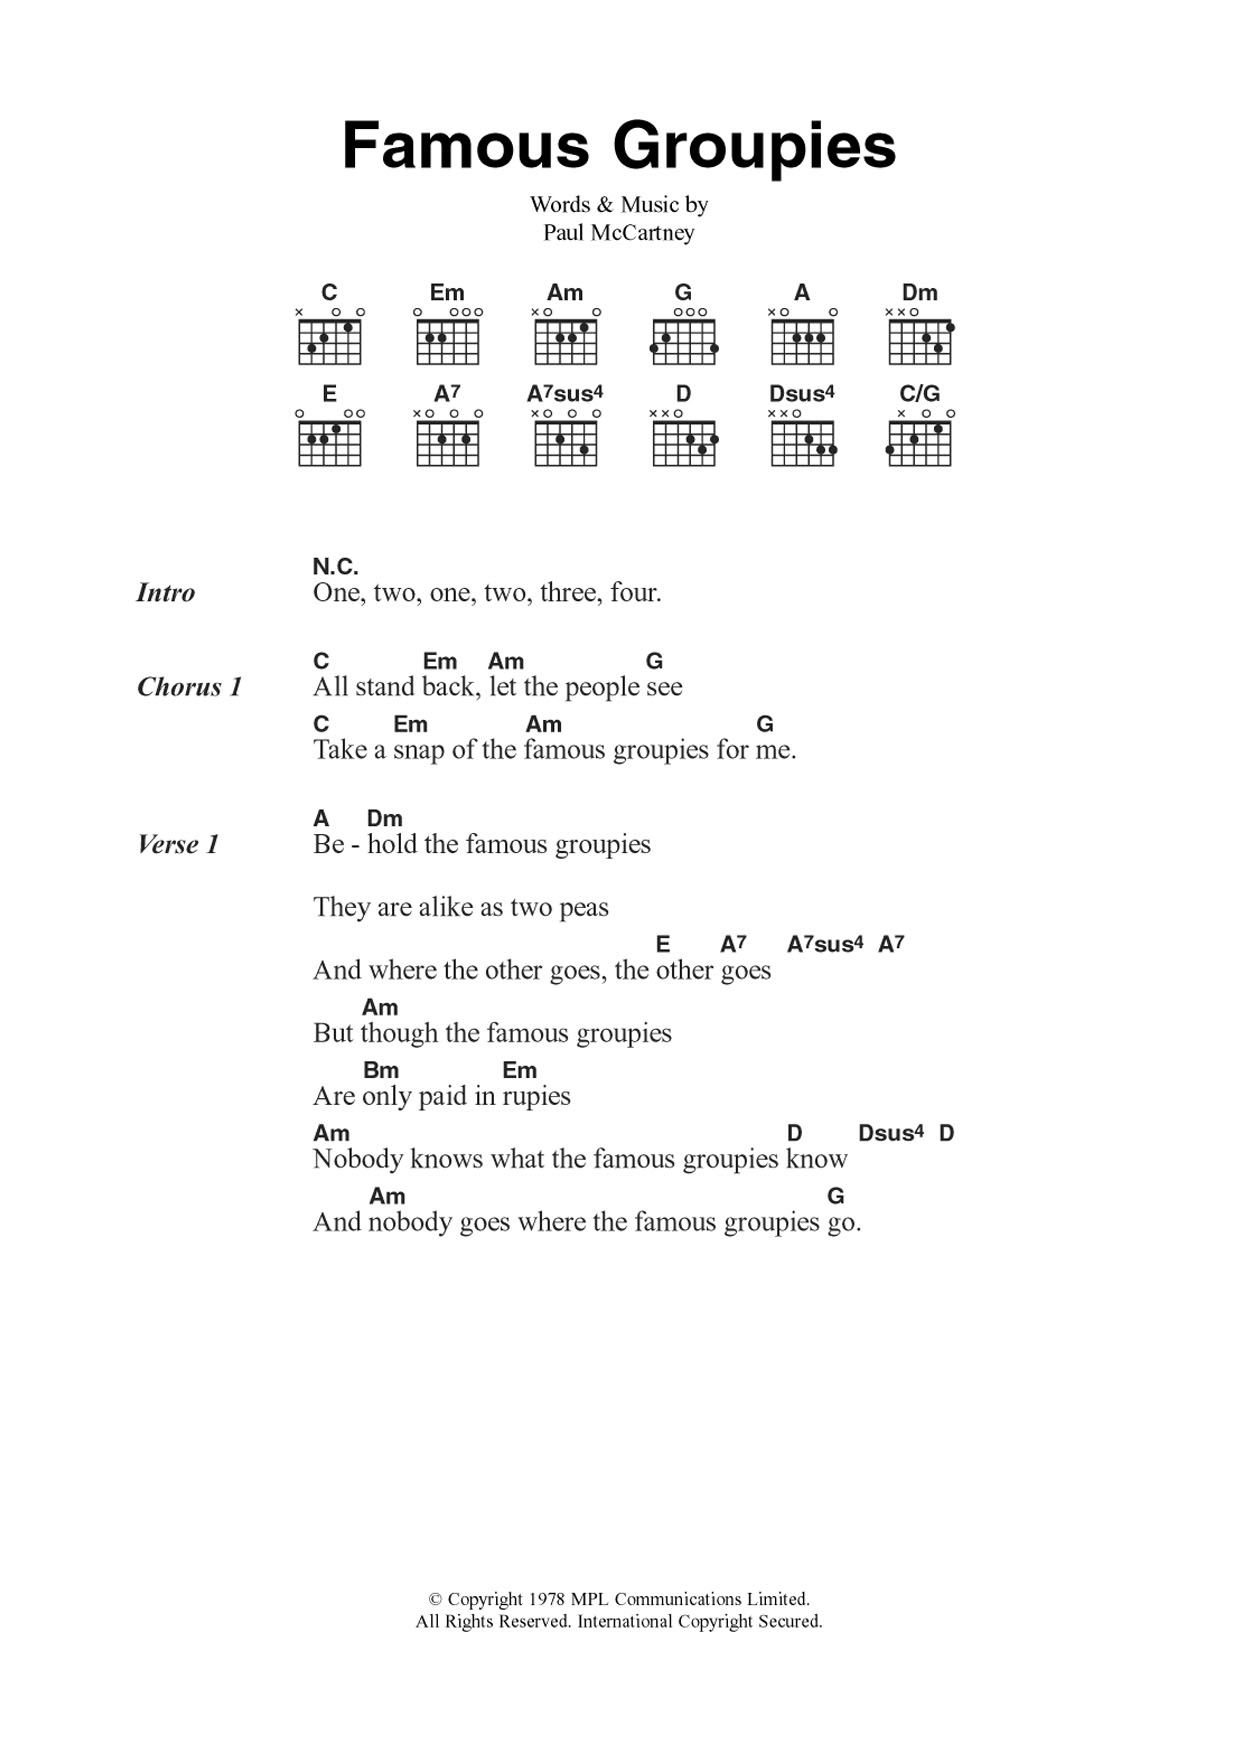 Famous Groupies Sheet Music